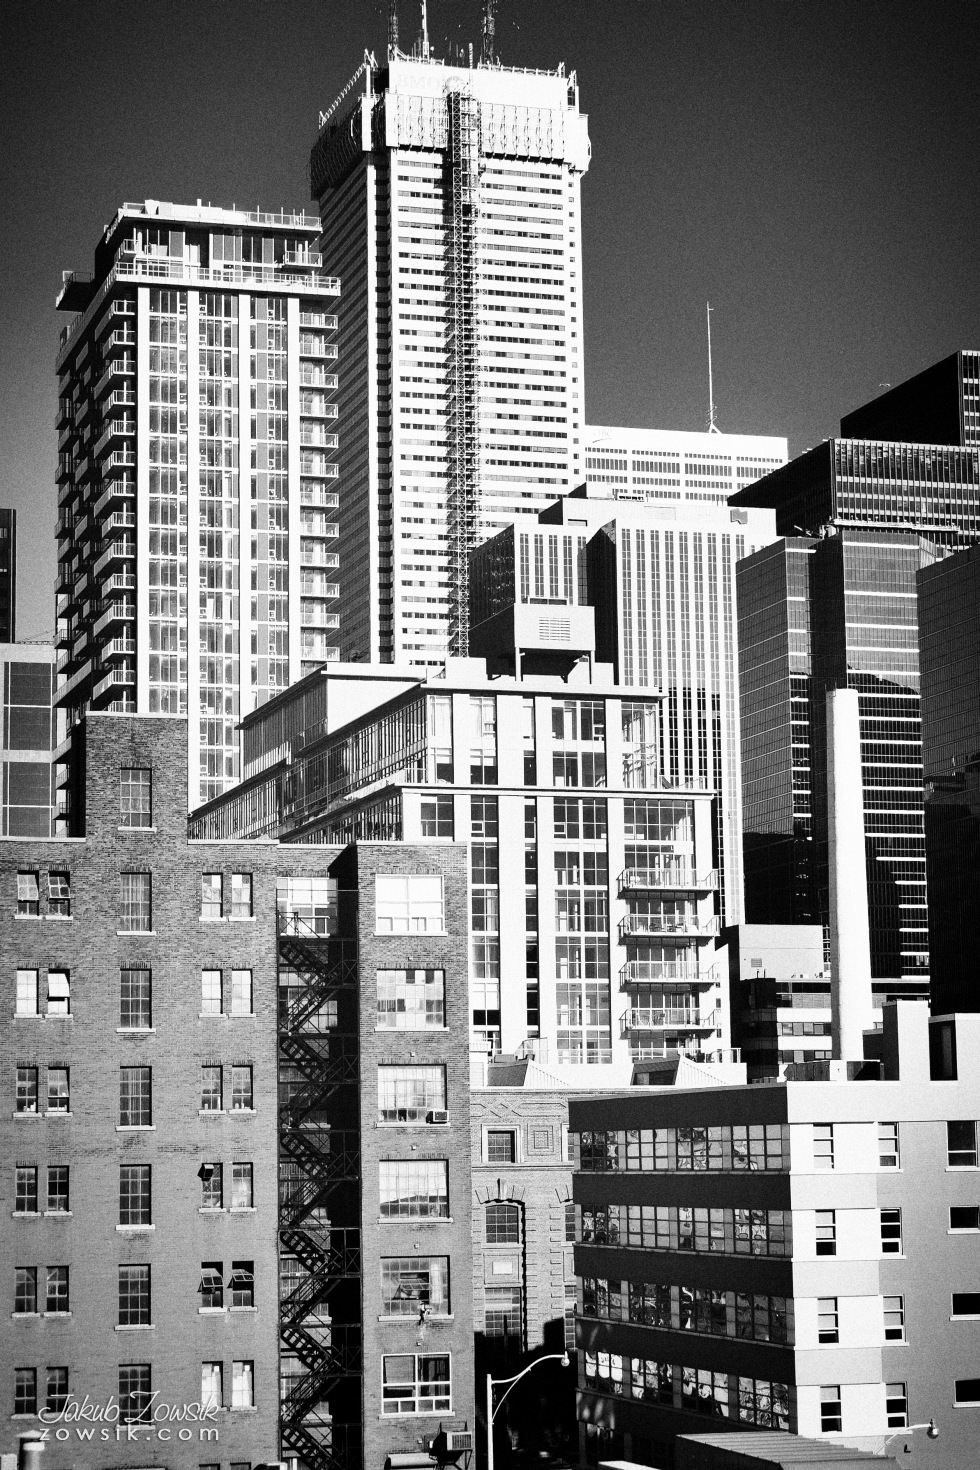 Toronto-picture-5dmk2-IMG_0188